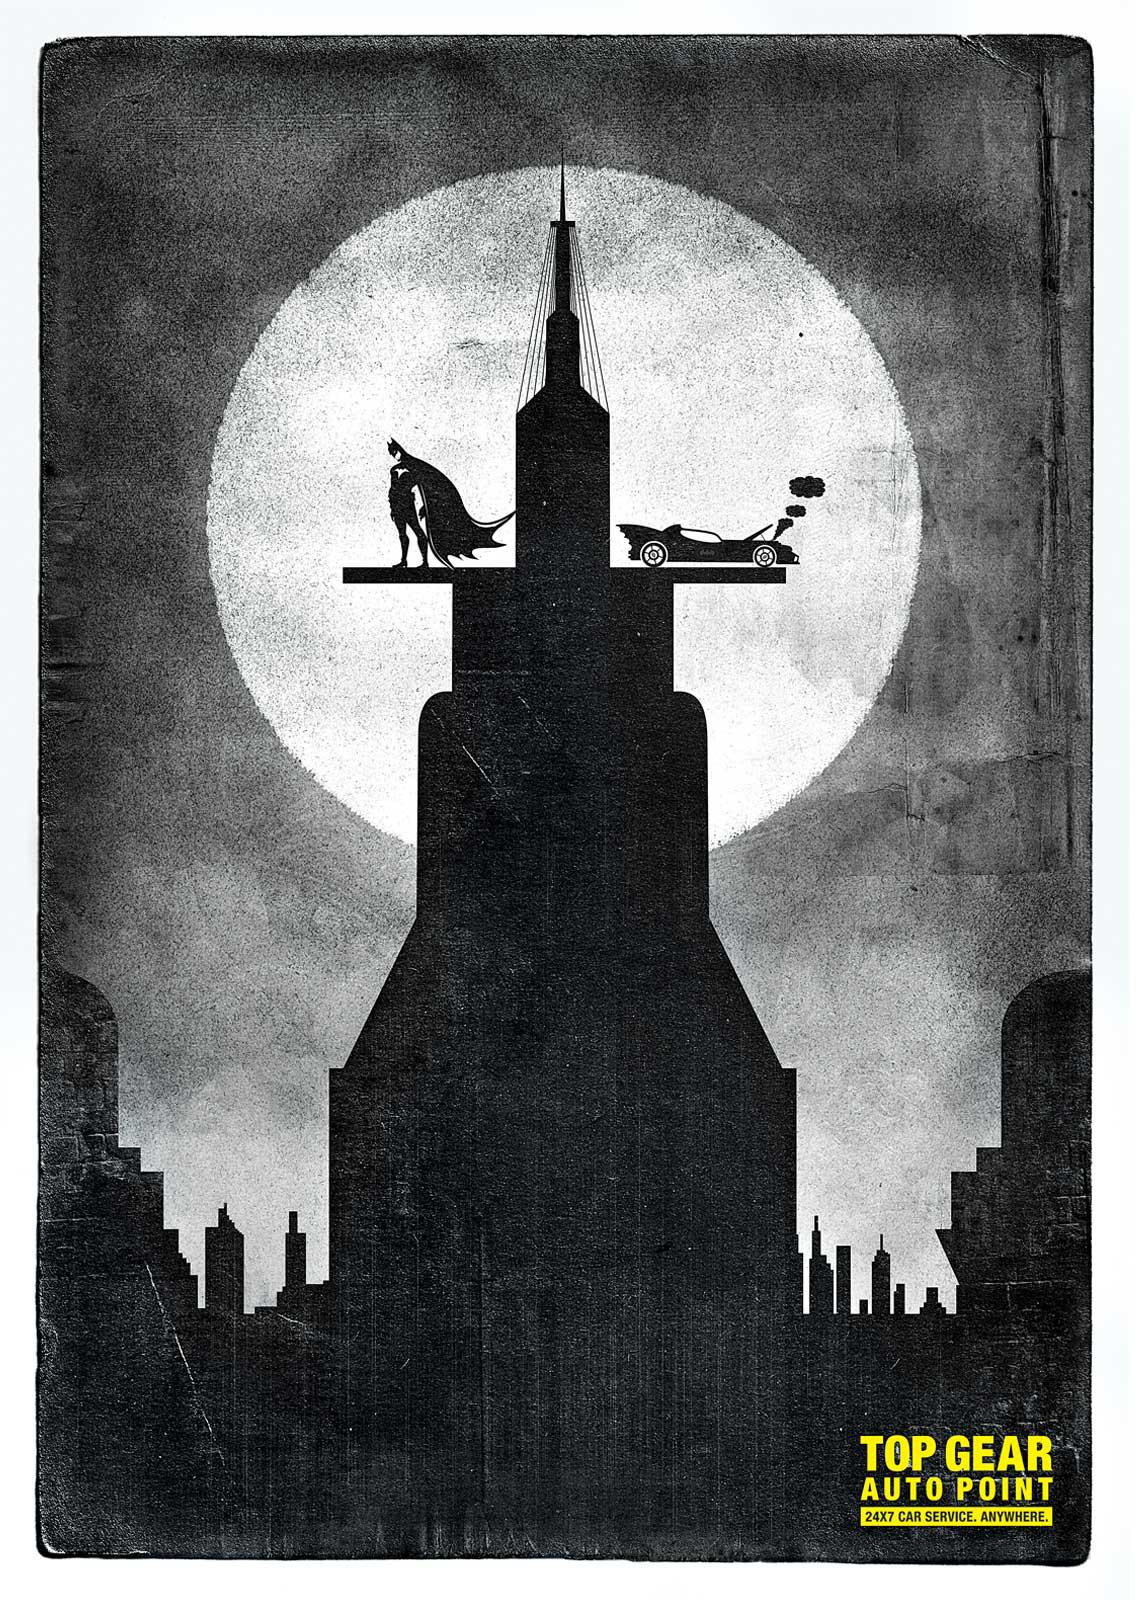 Top Gear Auto Point Print Ad -  Batman